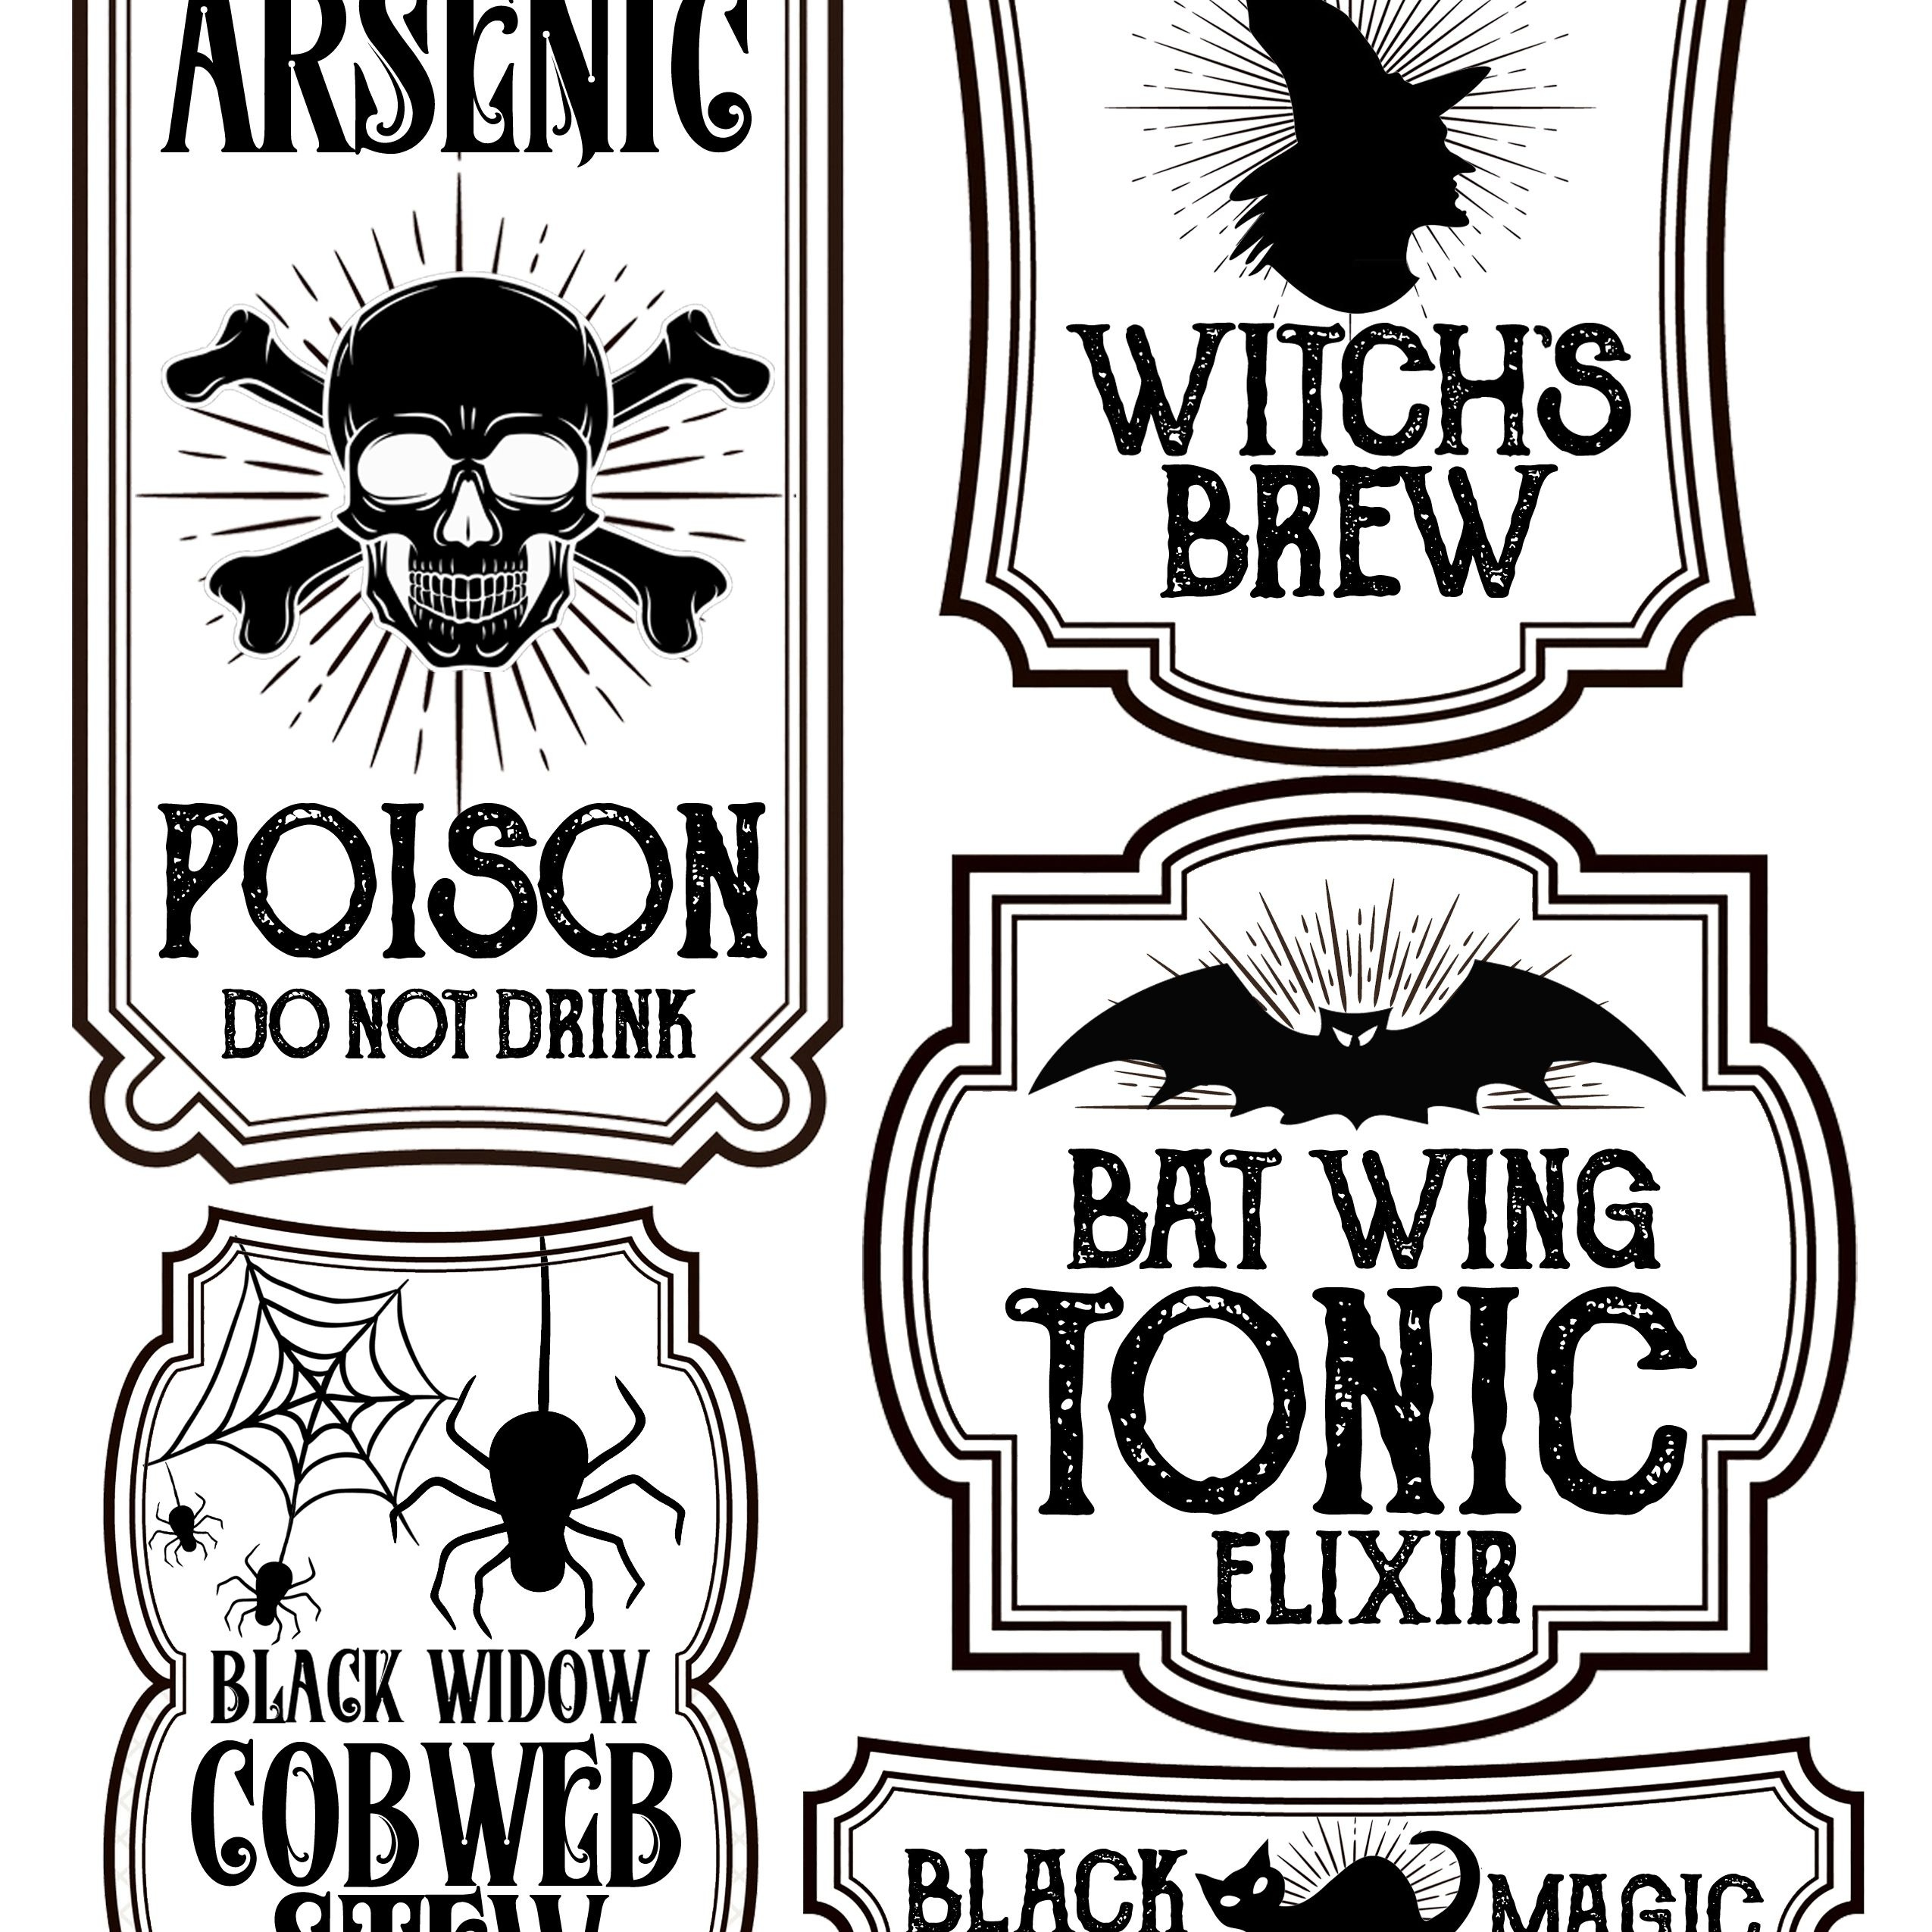 Halloween Bottle Labels - Free Printables - Potions Labels | Art - Free Printable Halloween Bottle Labels